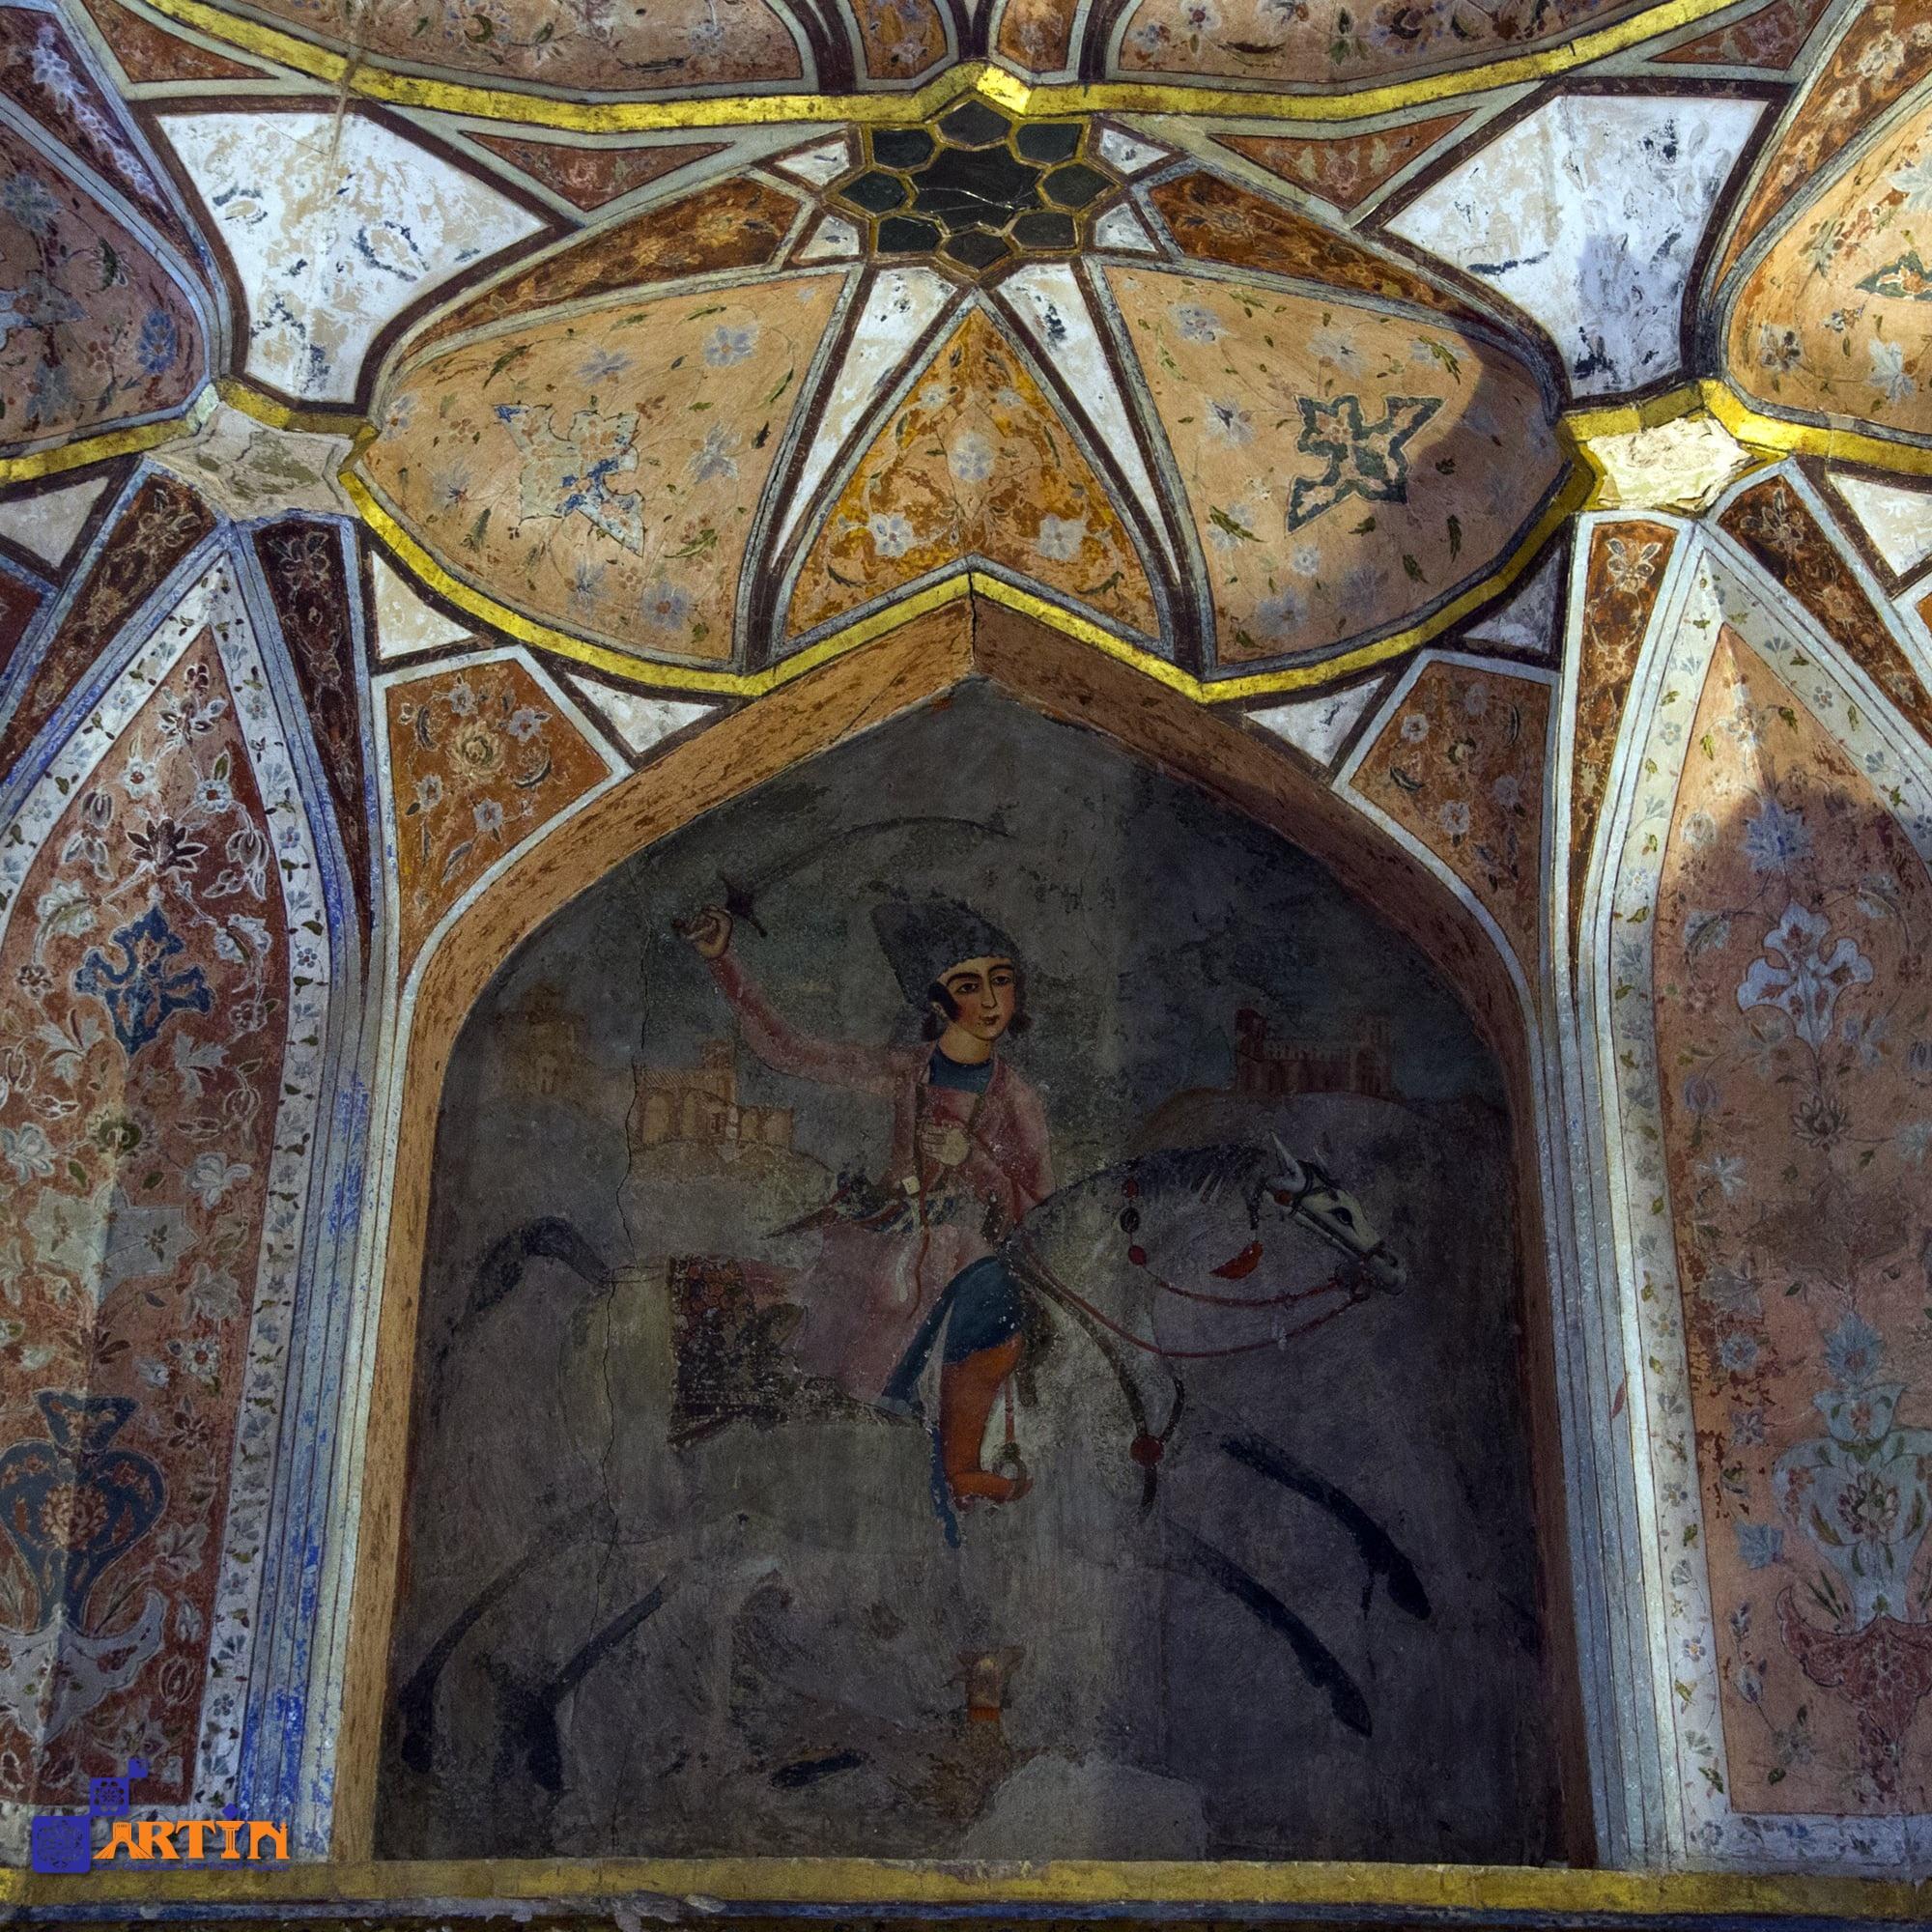 wall arts of hasht behesht royal palace in Isfahan